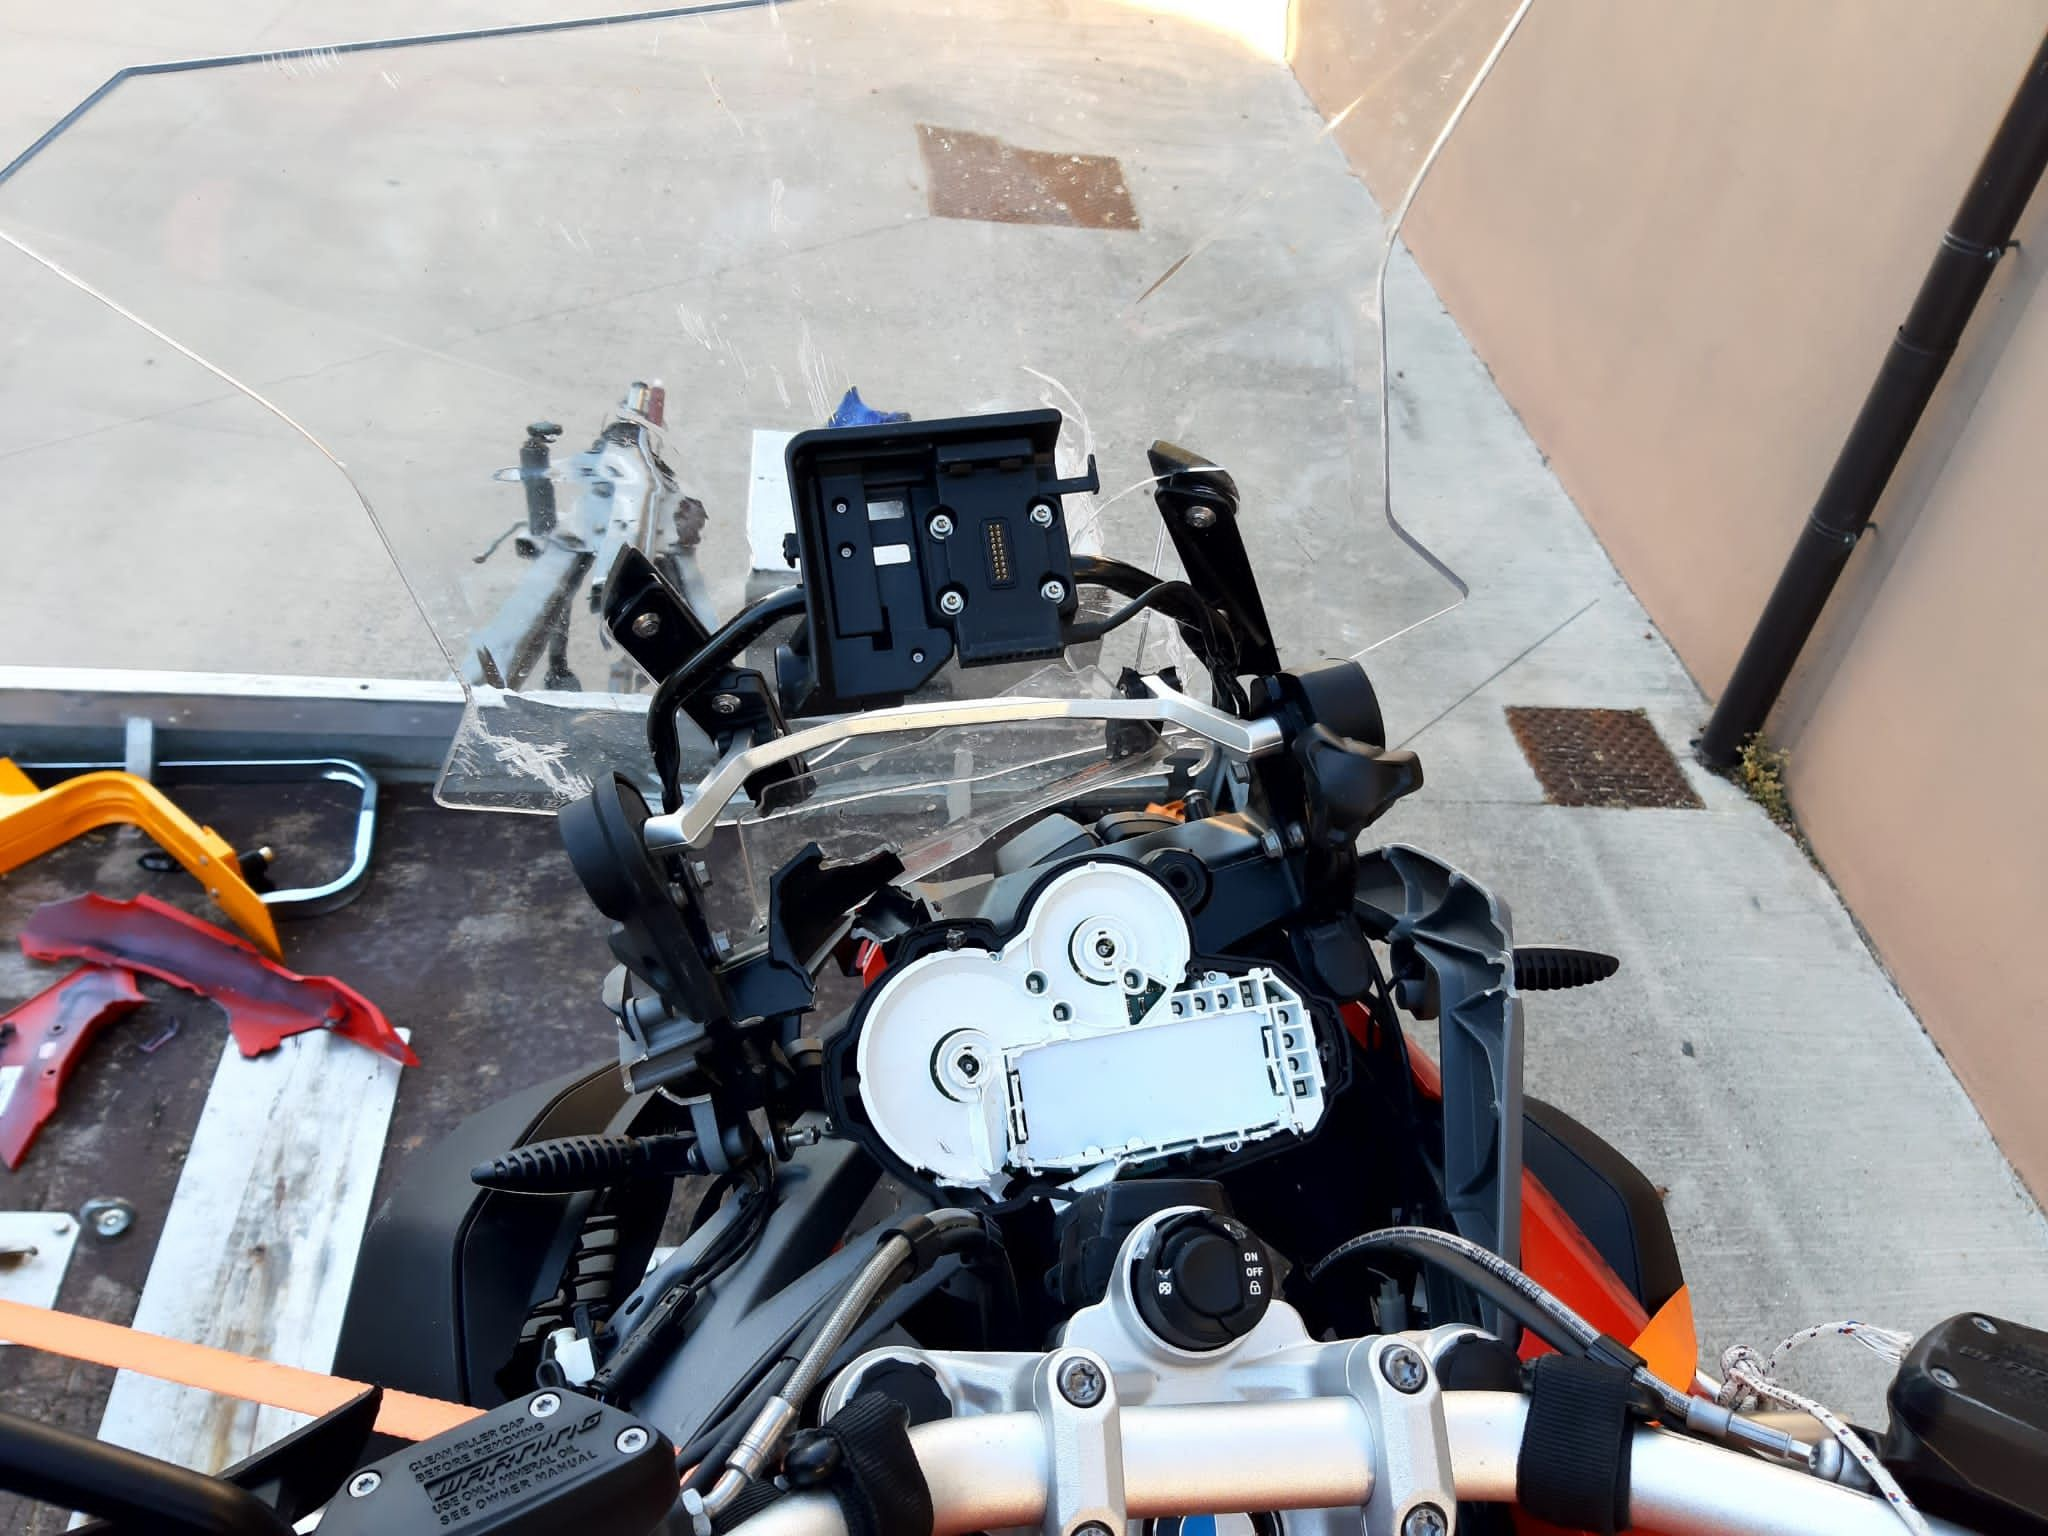 Compro moto incidentate